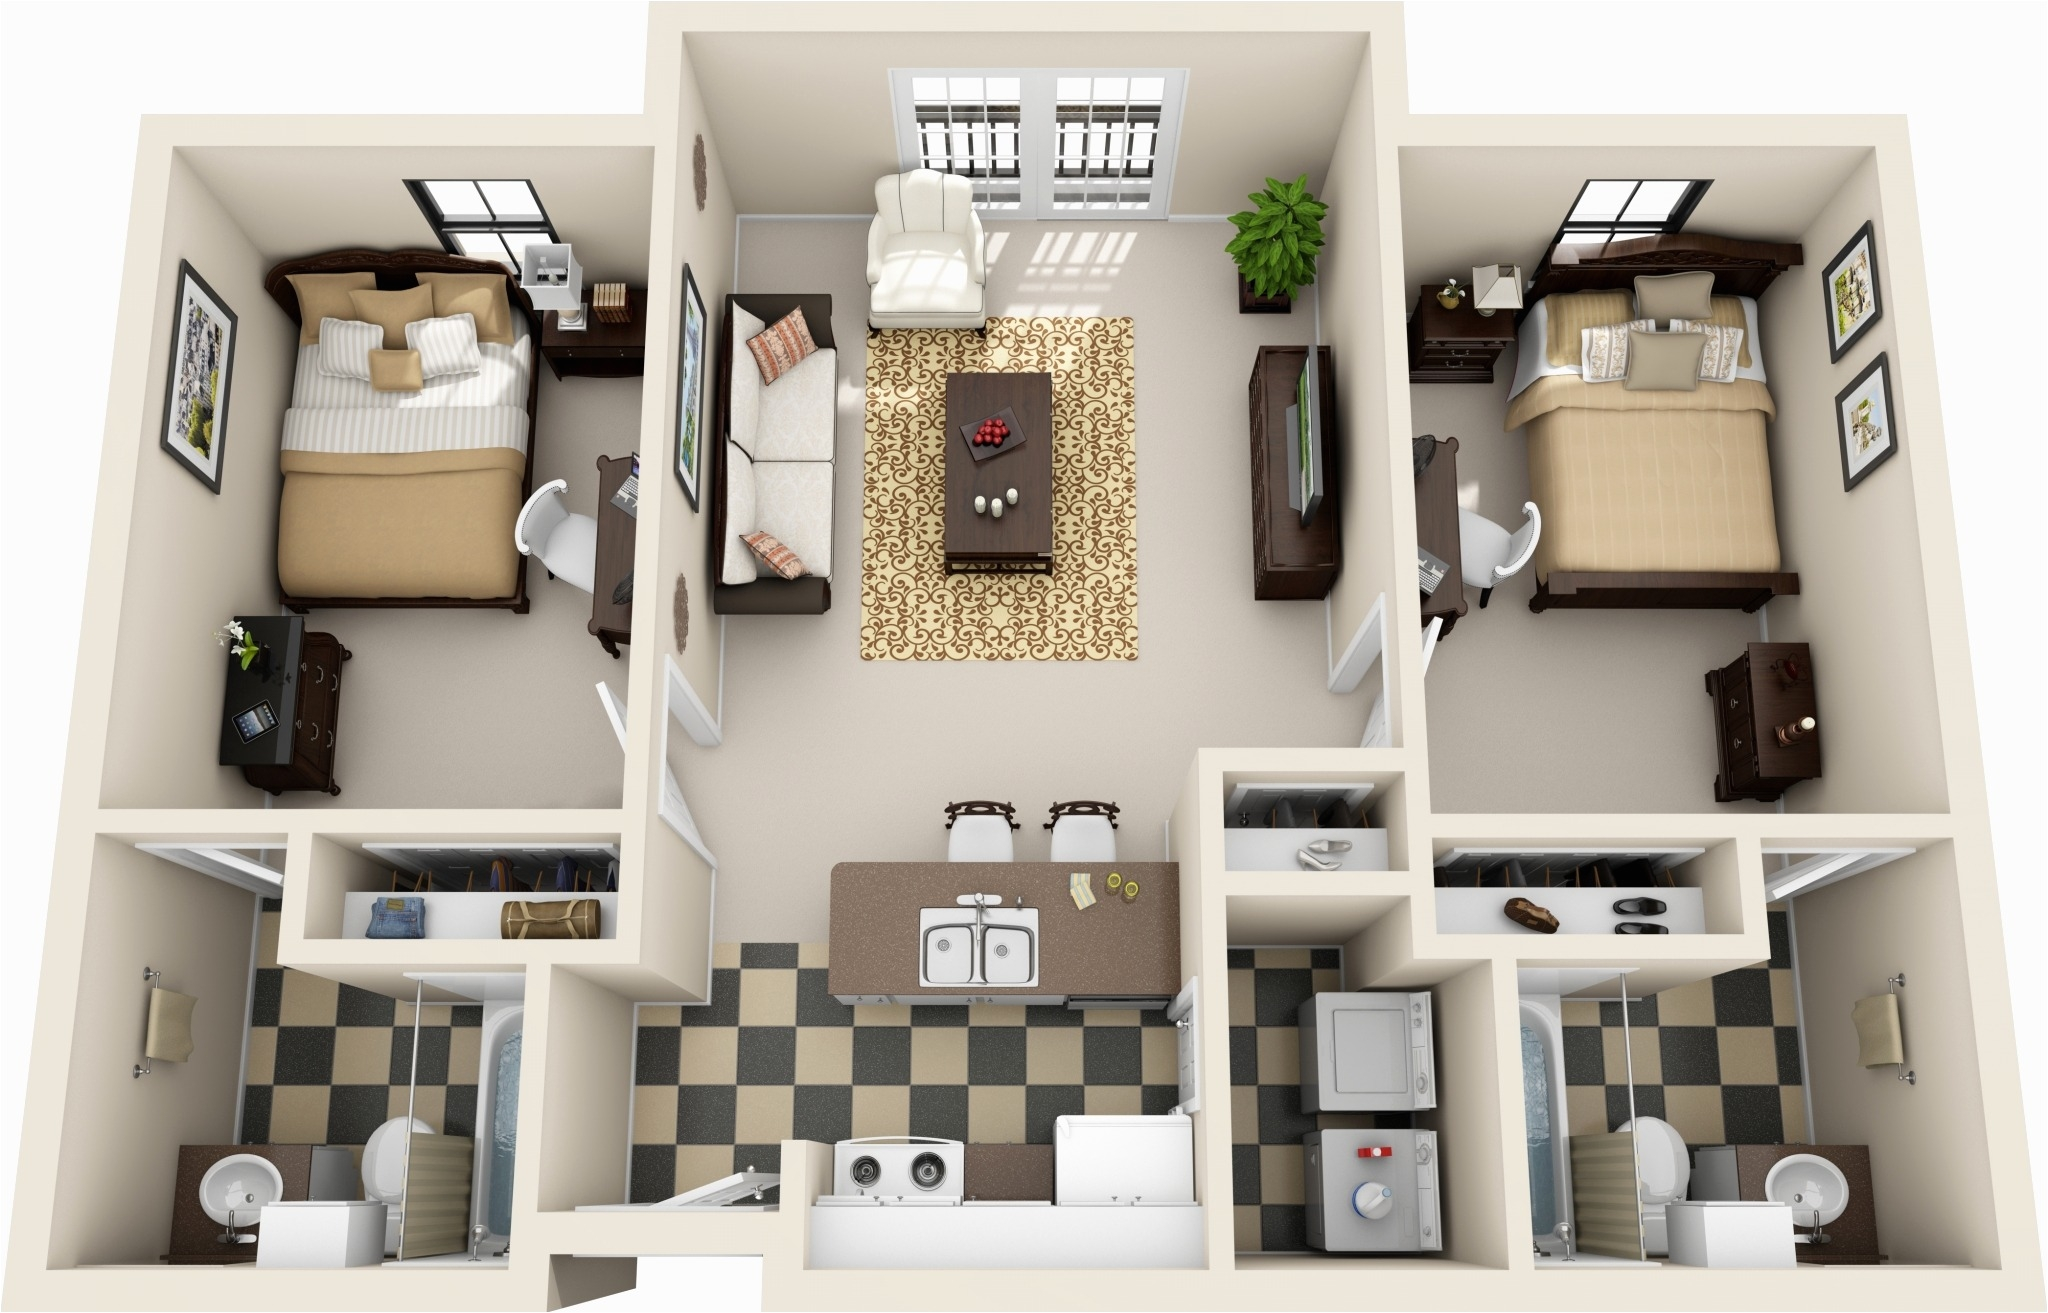 2 Bedroom Apartments In Baton Rouge Louisiana 12 2 Bedroom Apartments Review Best Bedroom Design Ideas Best